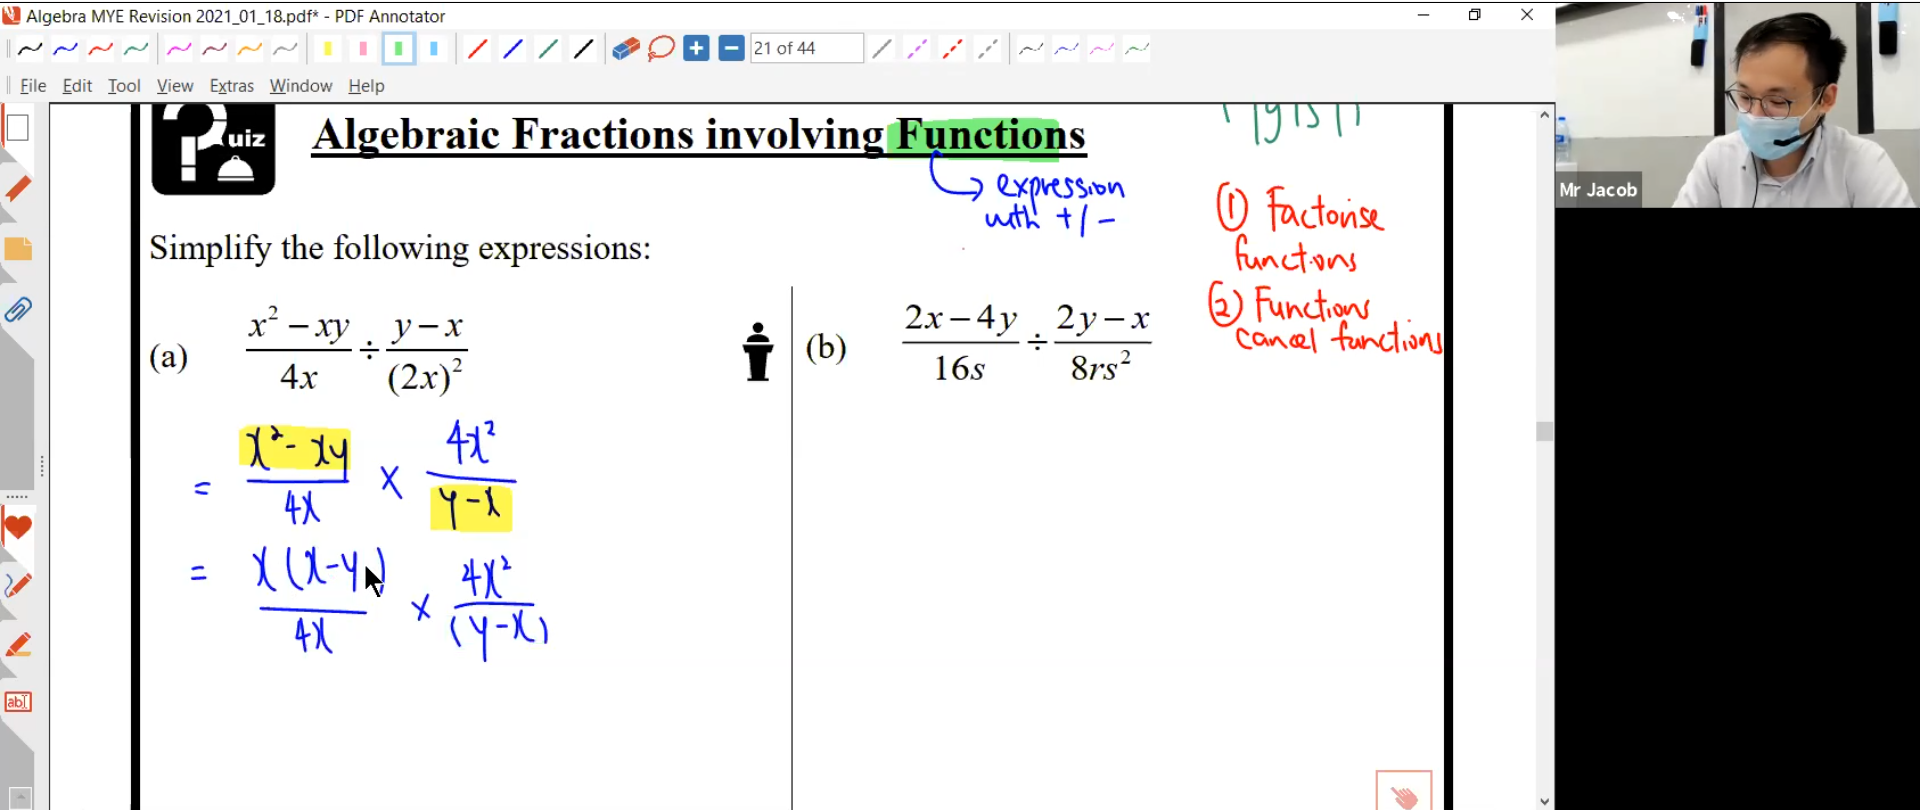 22. MYE Revision L3 (MATH)